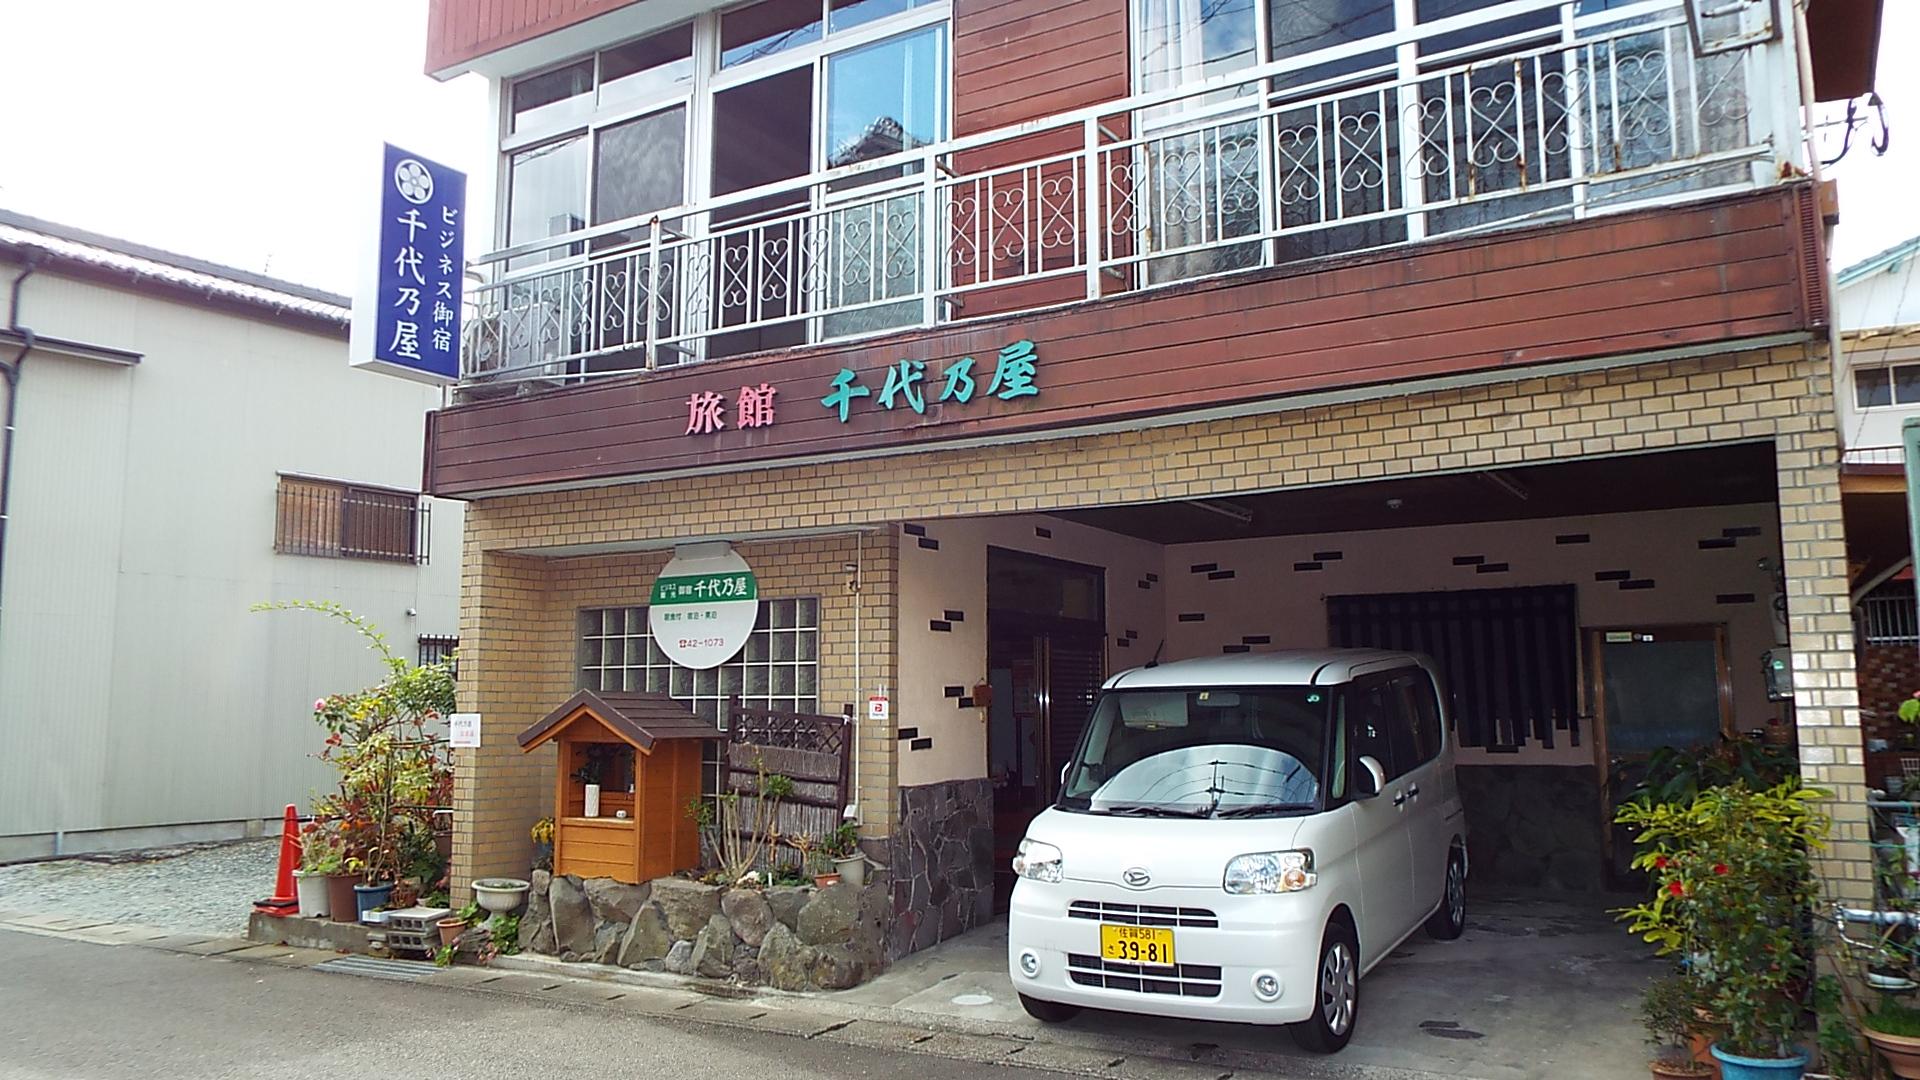 佐賀県嬉野市嬉野町下宿乙800 ビジネス旅館千代乃屋 -01